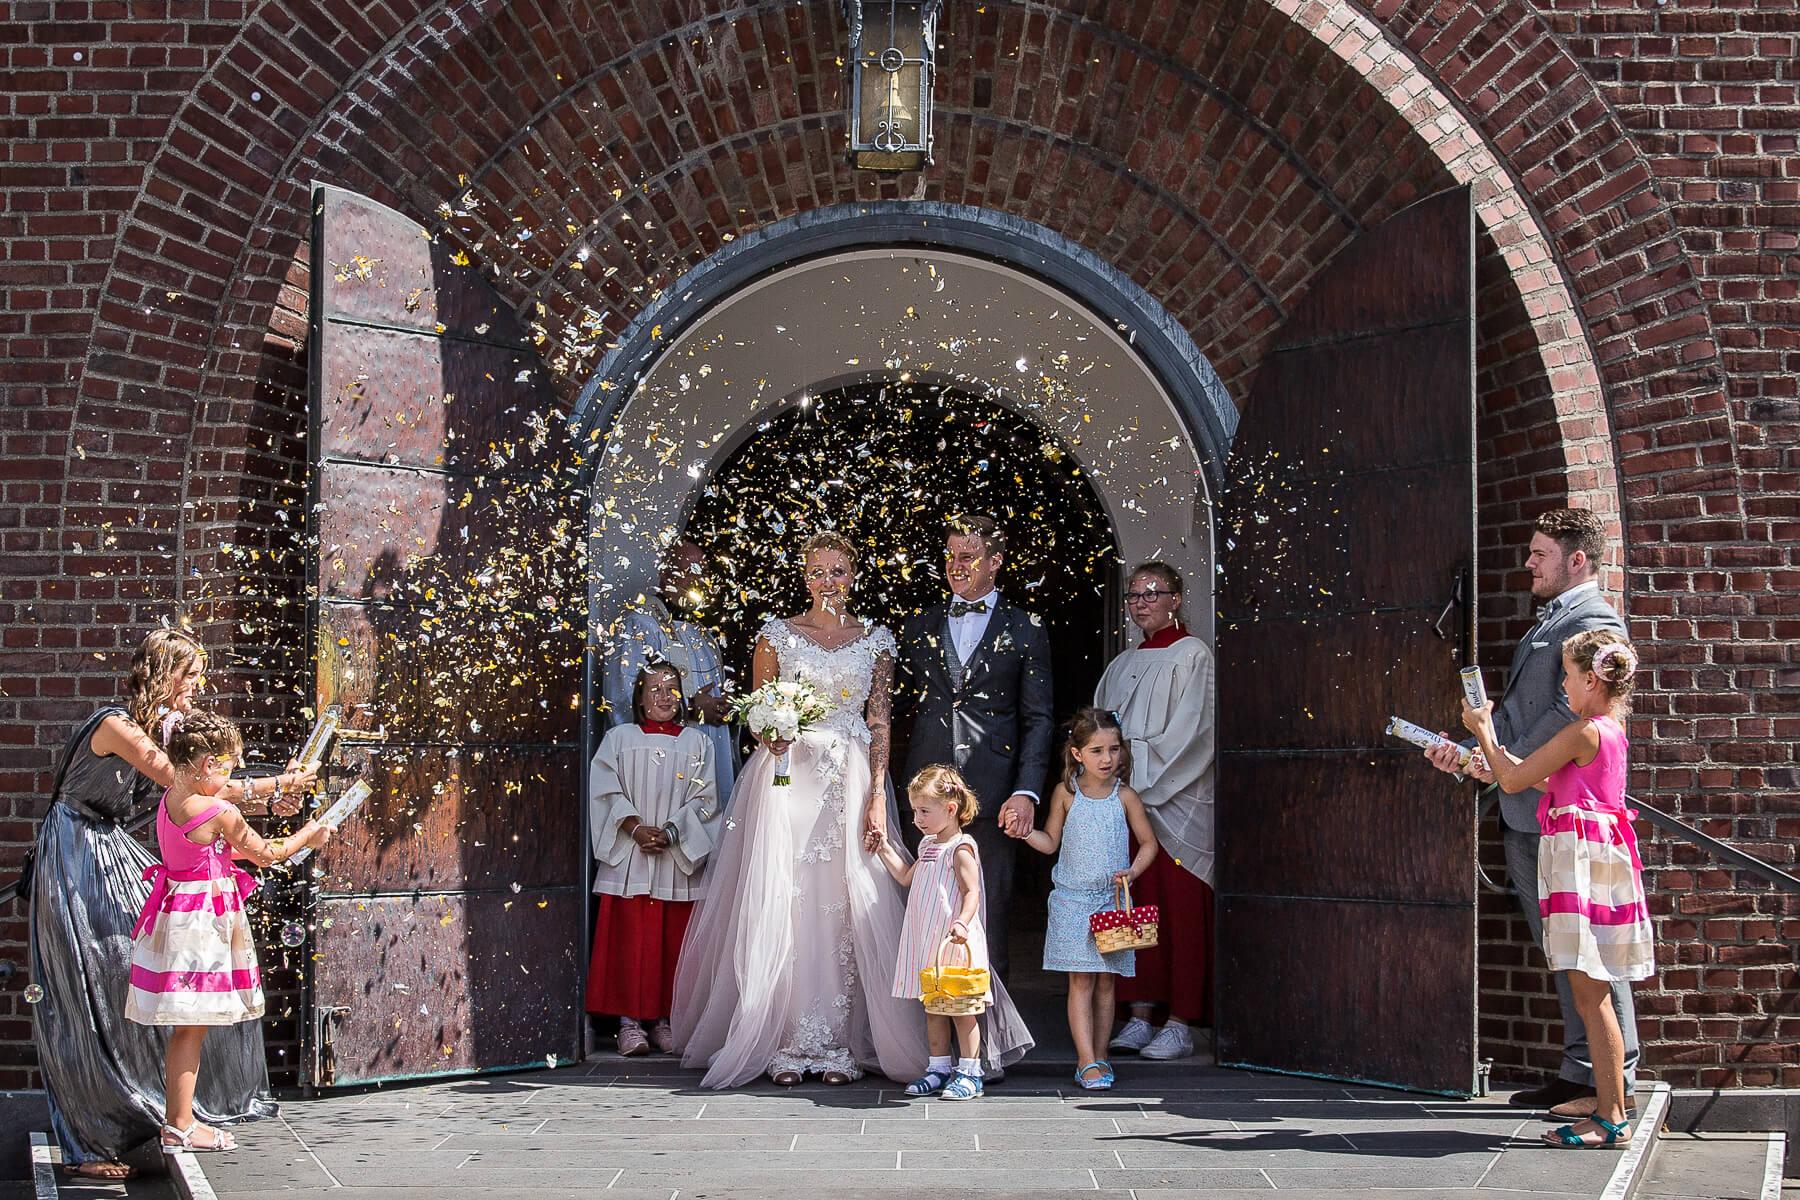 Hochzeitsreportage   Paarshooting  Burg Baesweiler 01